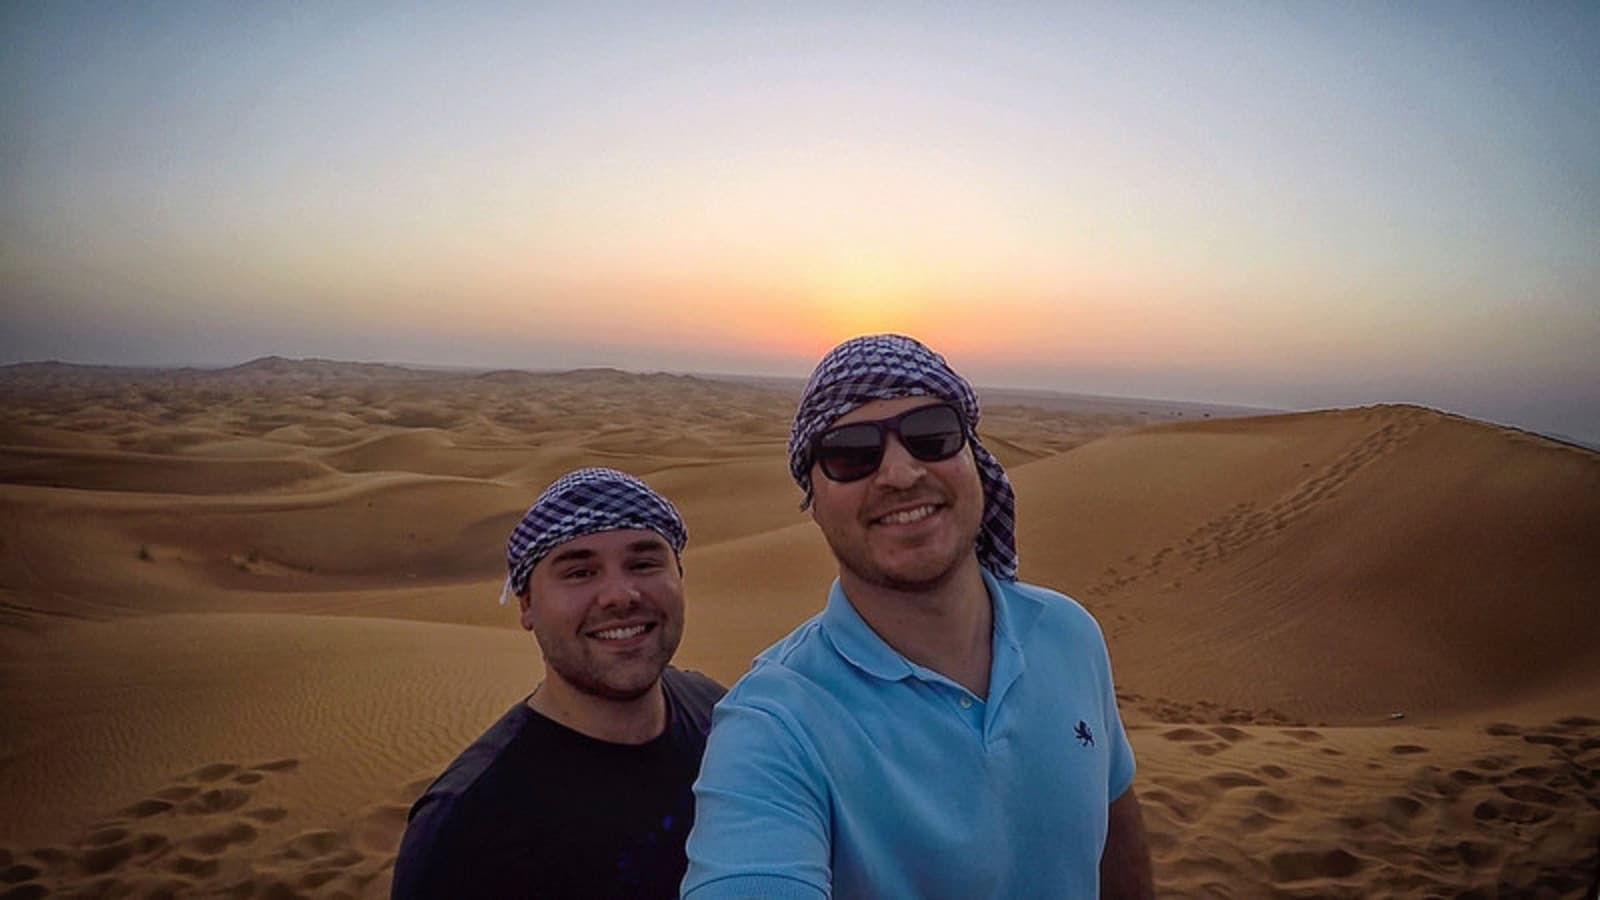 Exploring the sand dunes of Dubai